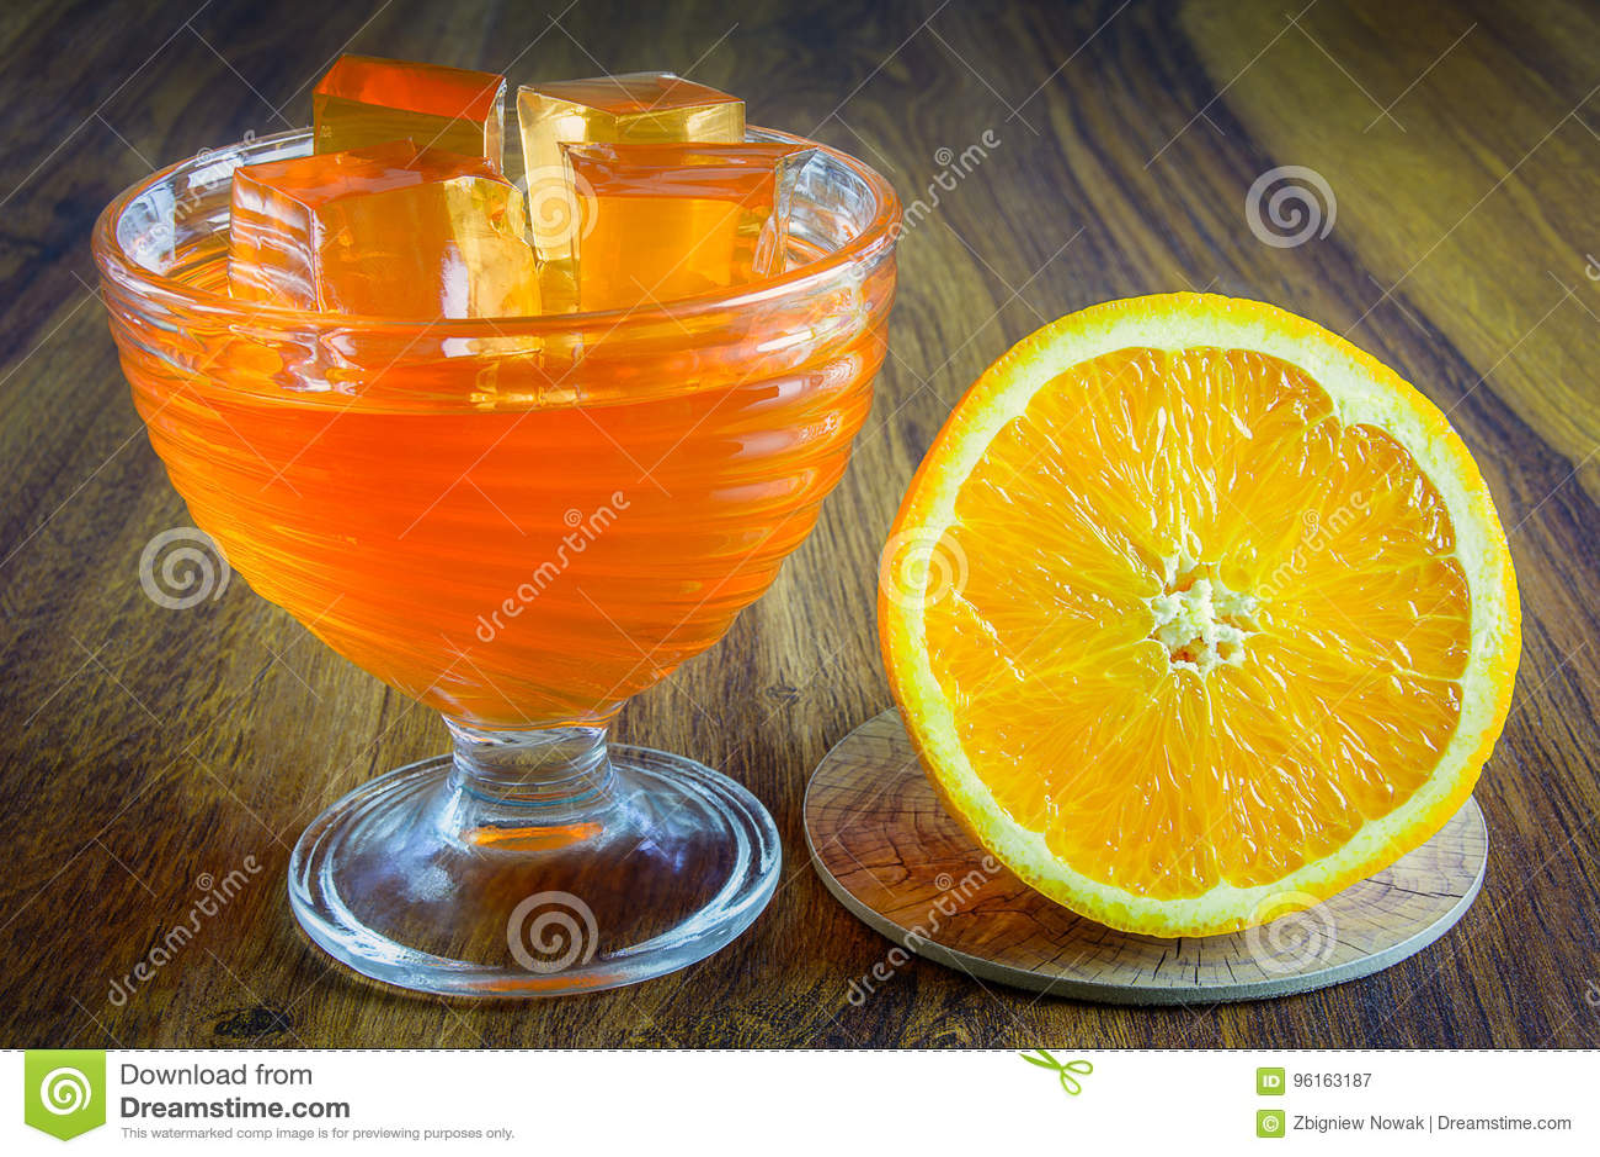 Orange jelly with fruit.